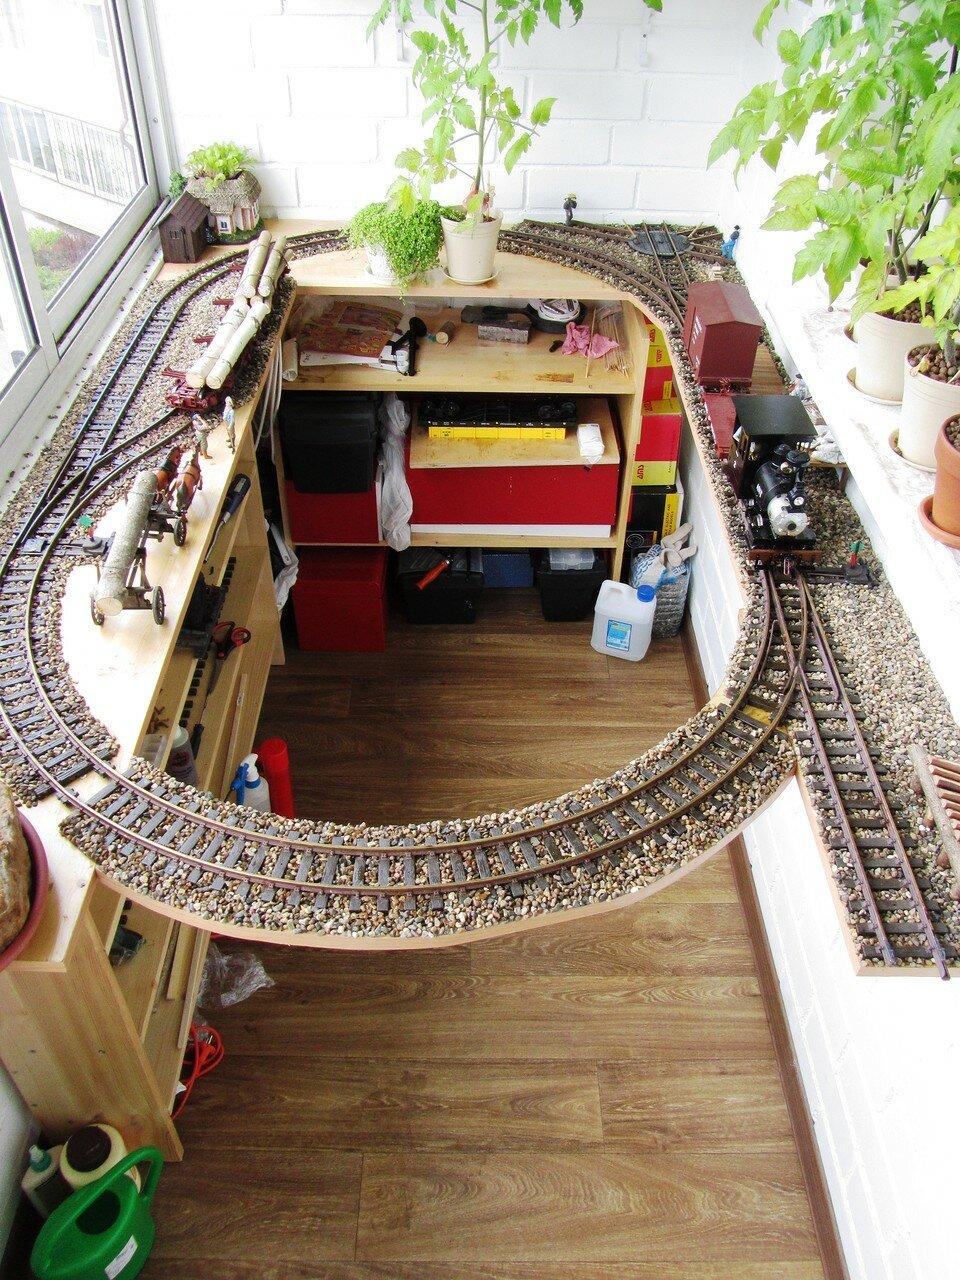 Small Balcony Garden Railway - Garden Railway Forum